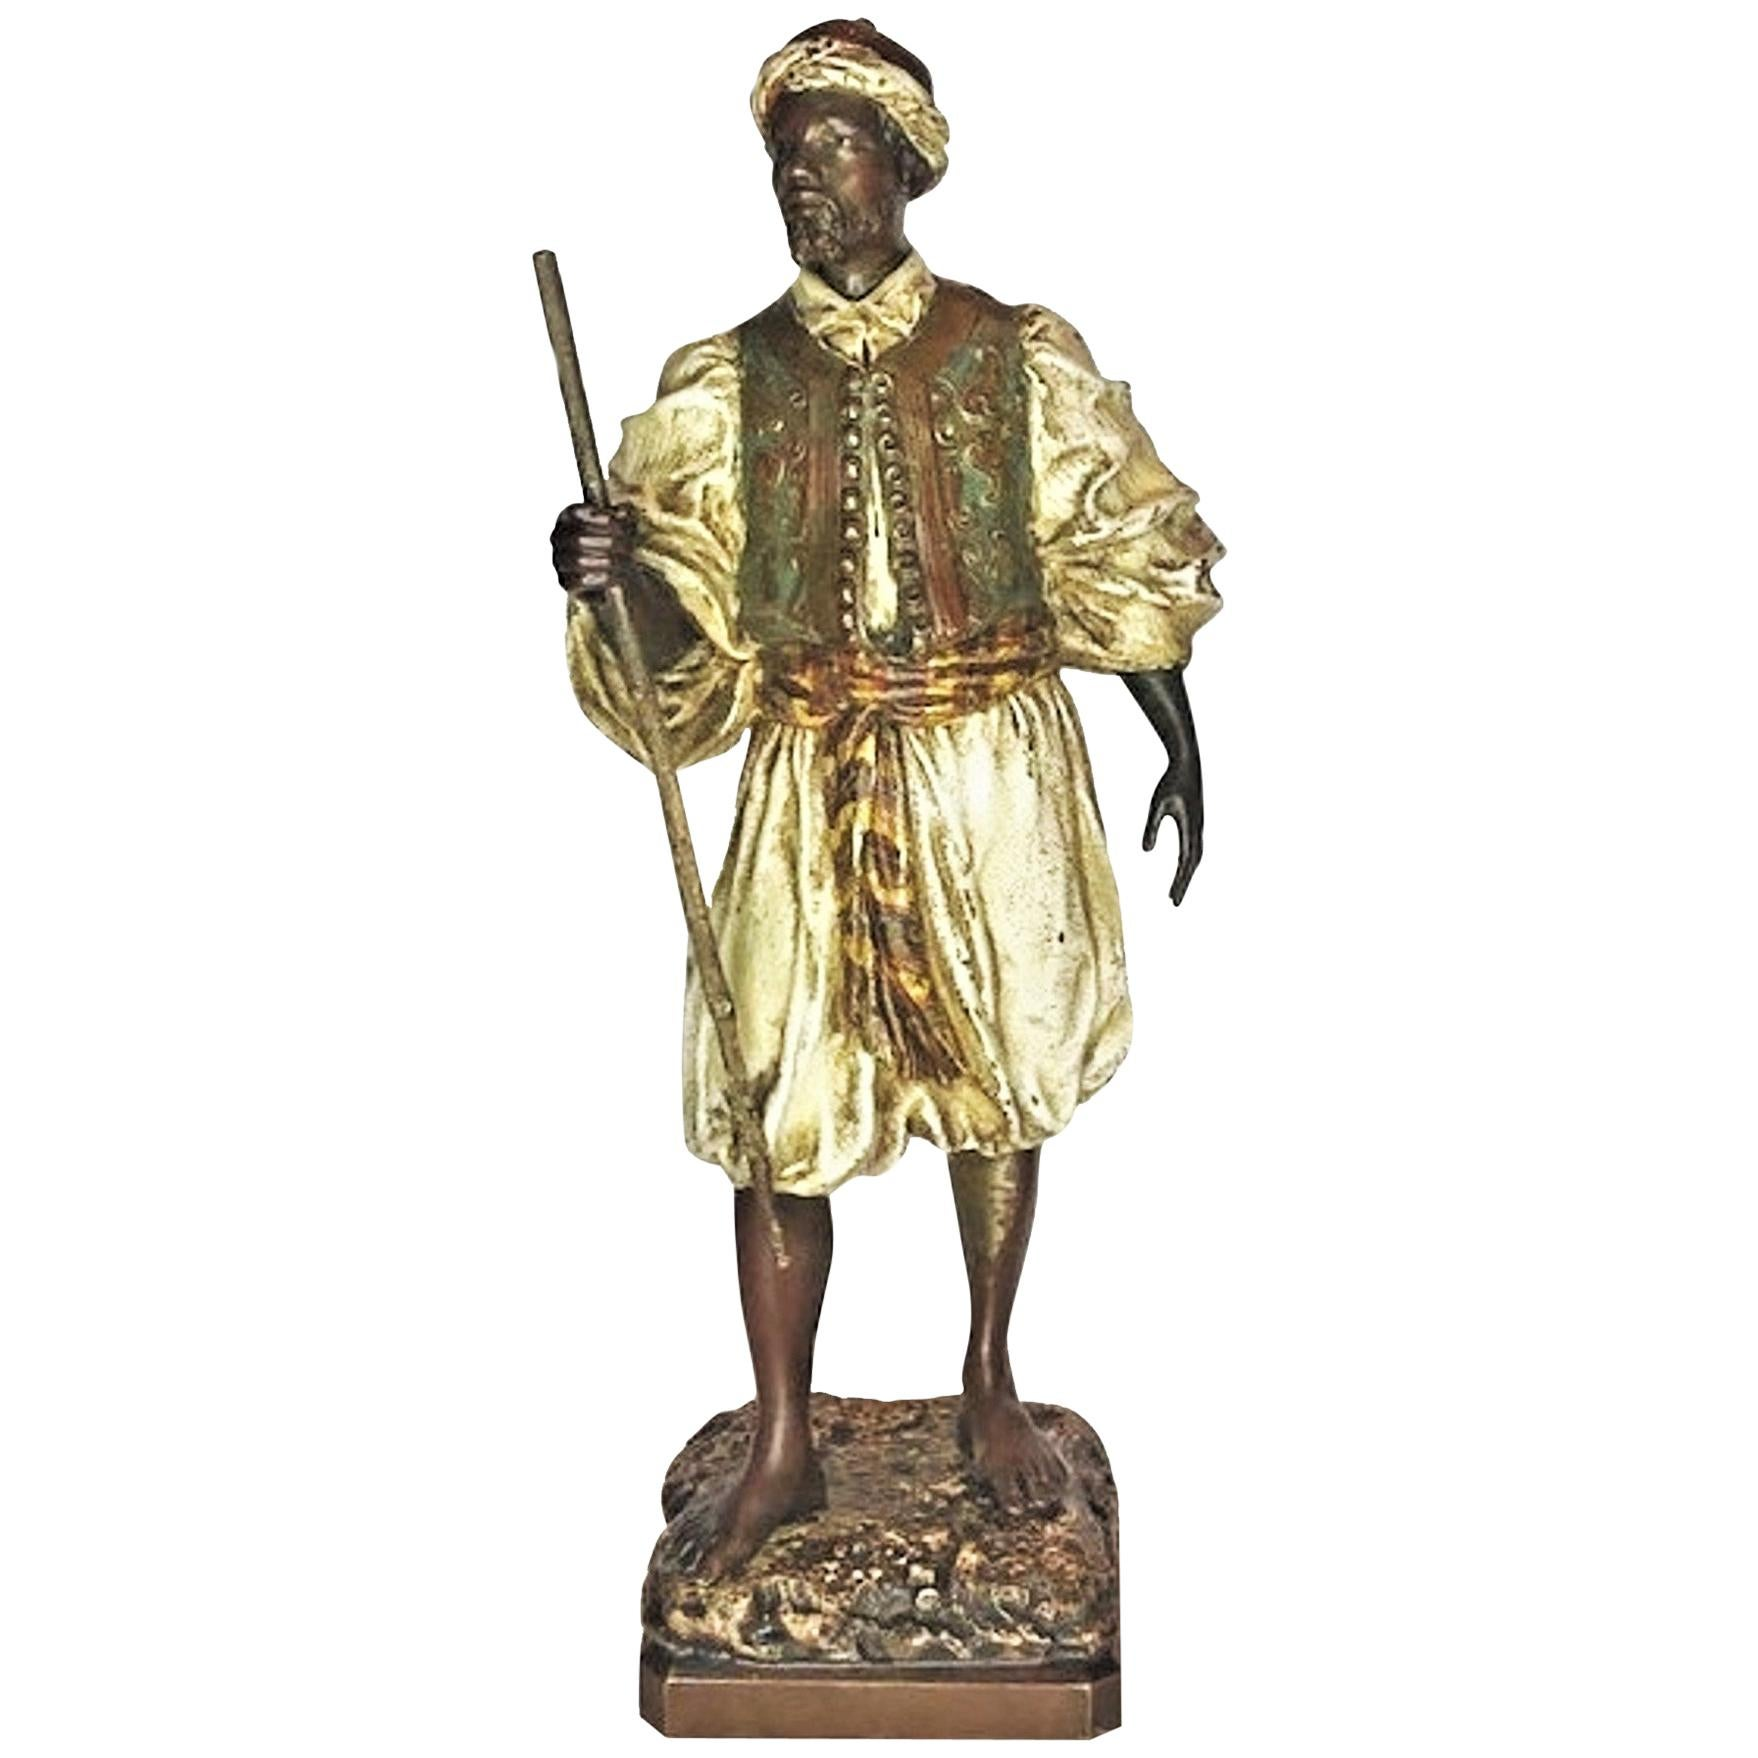 Franz Bergmann, Moorish Traveler w/ Staff, Vienna Bronze Sculpture, Ca. 1900